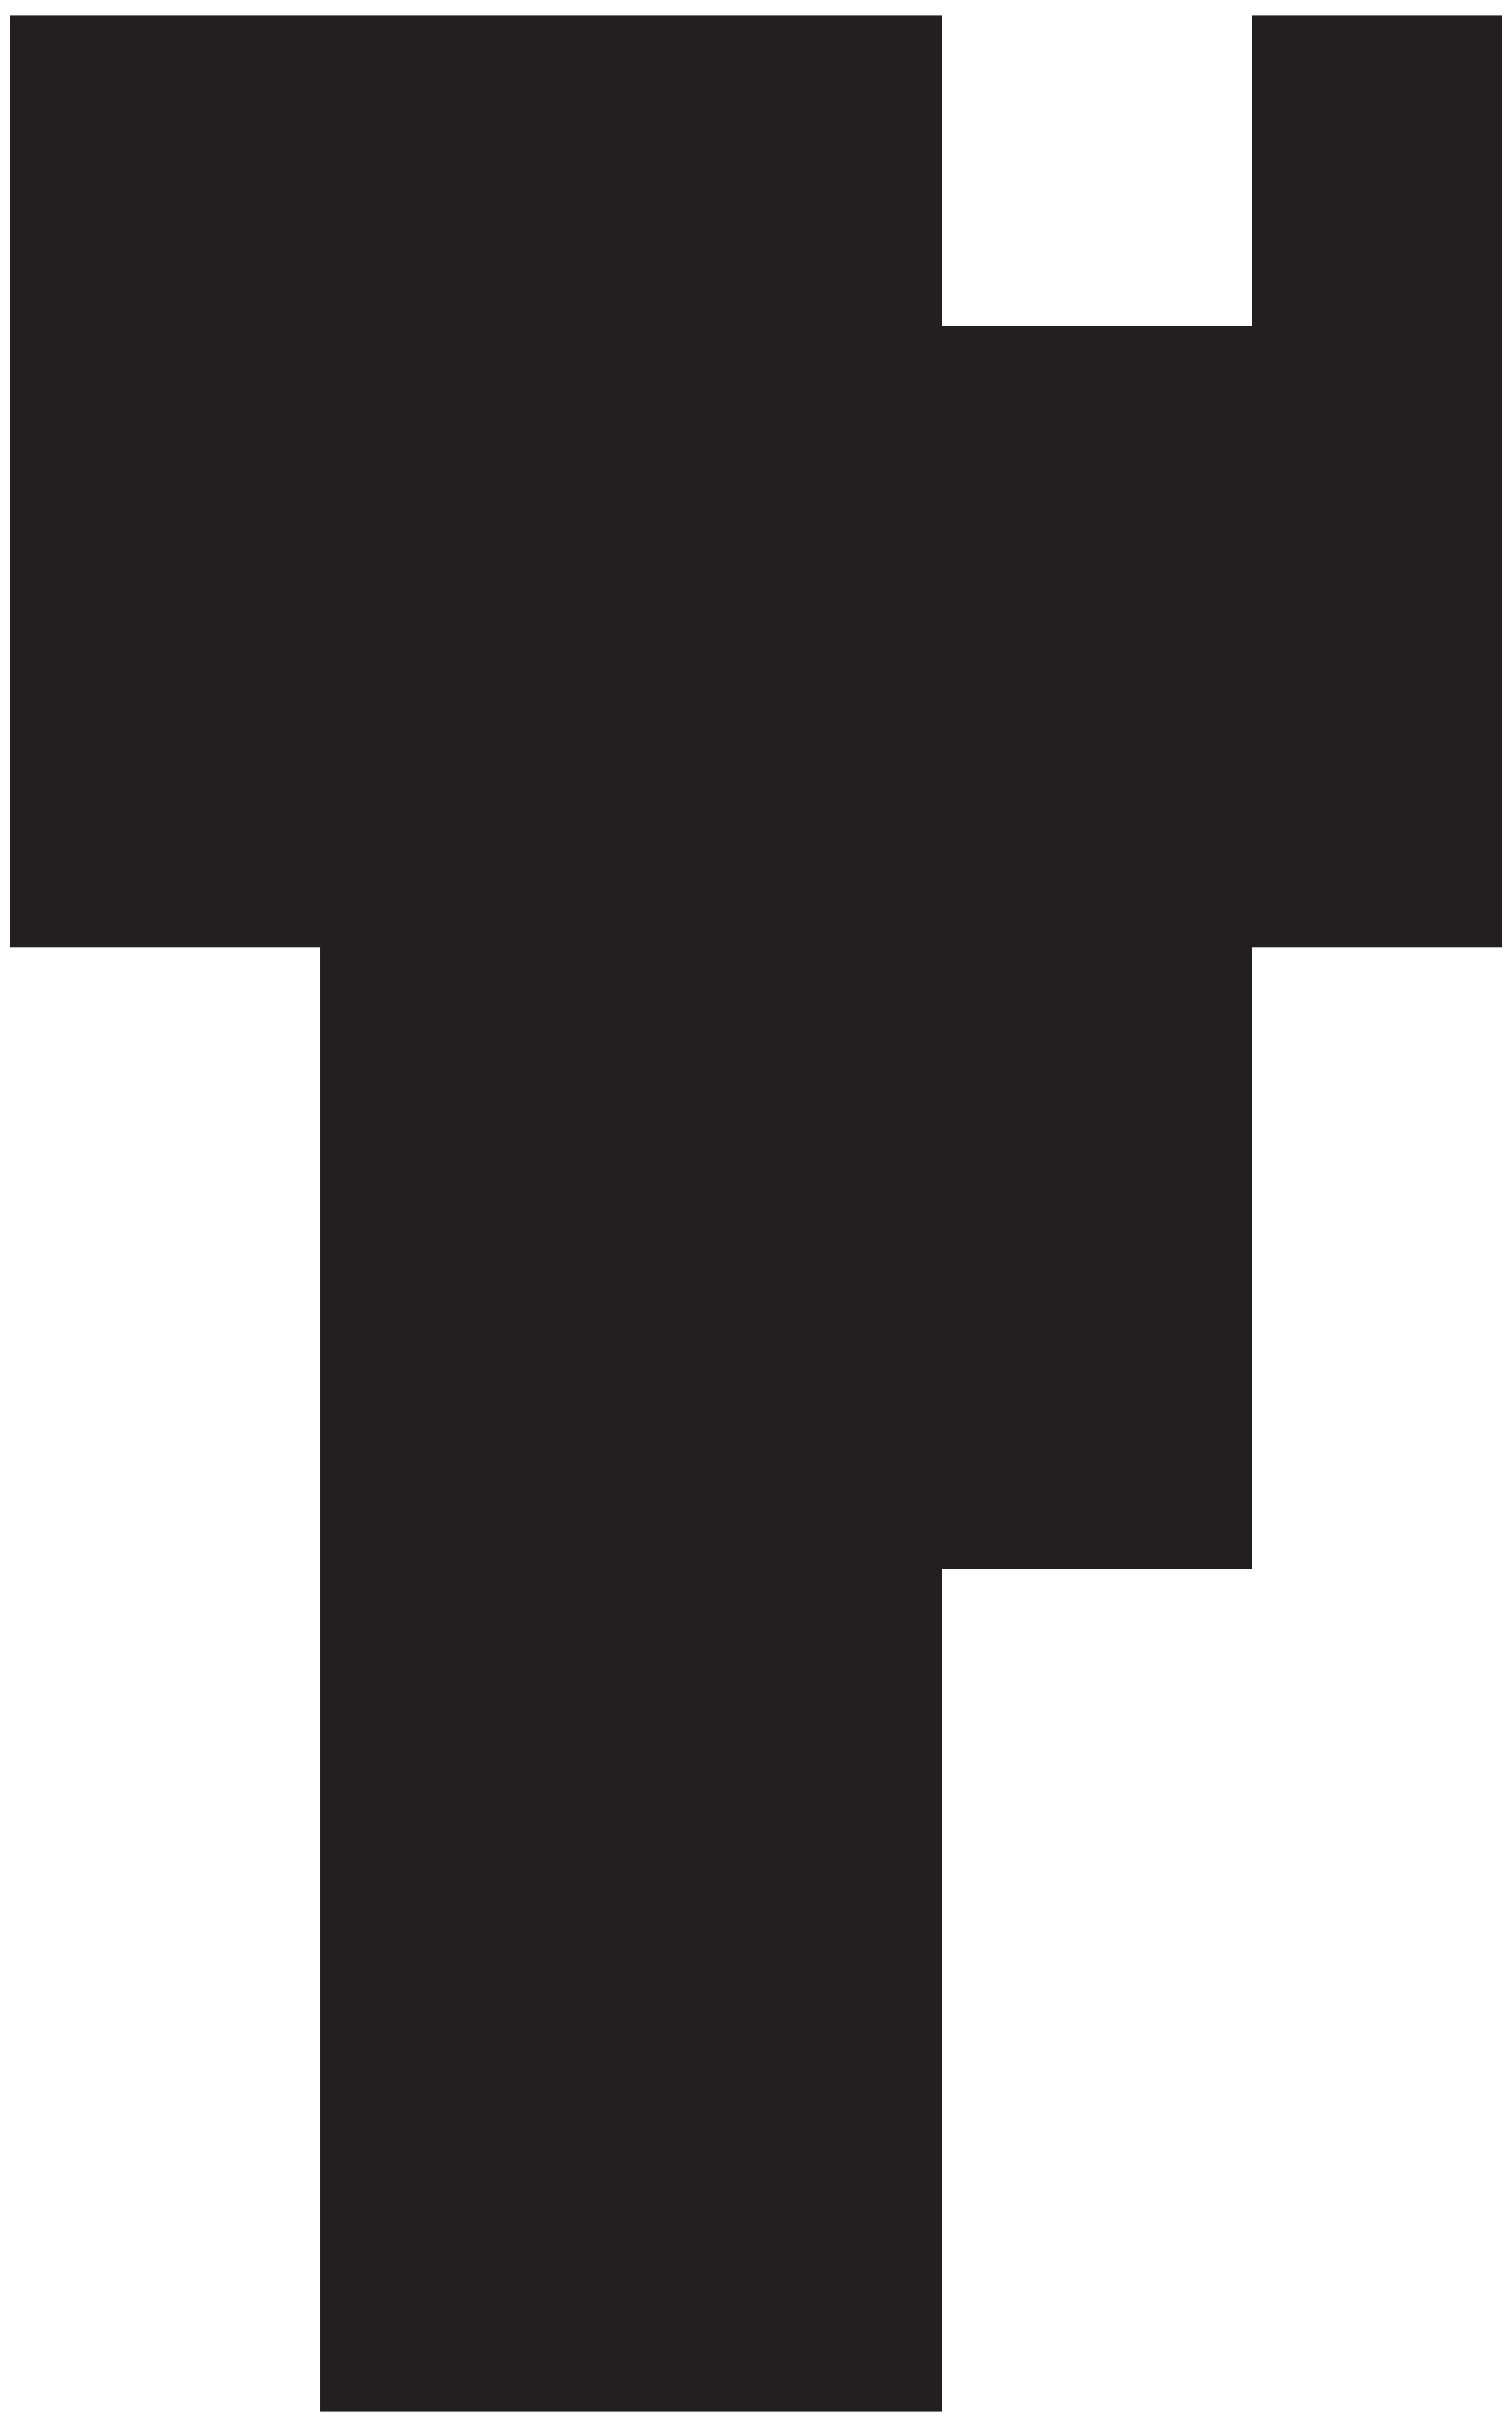 Fairy Silhouette Clip art.